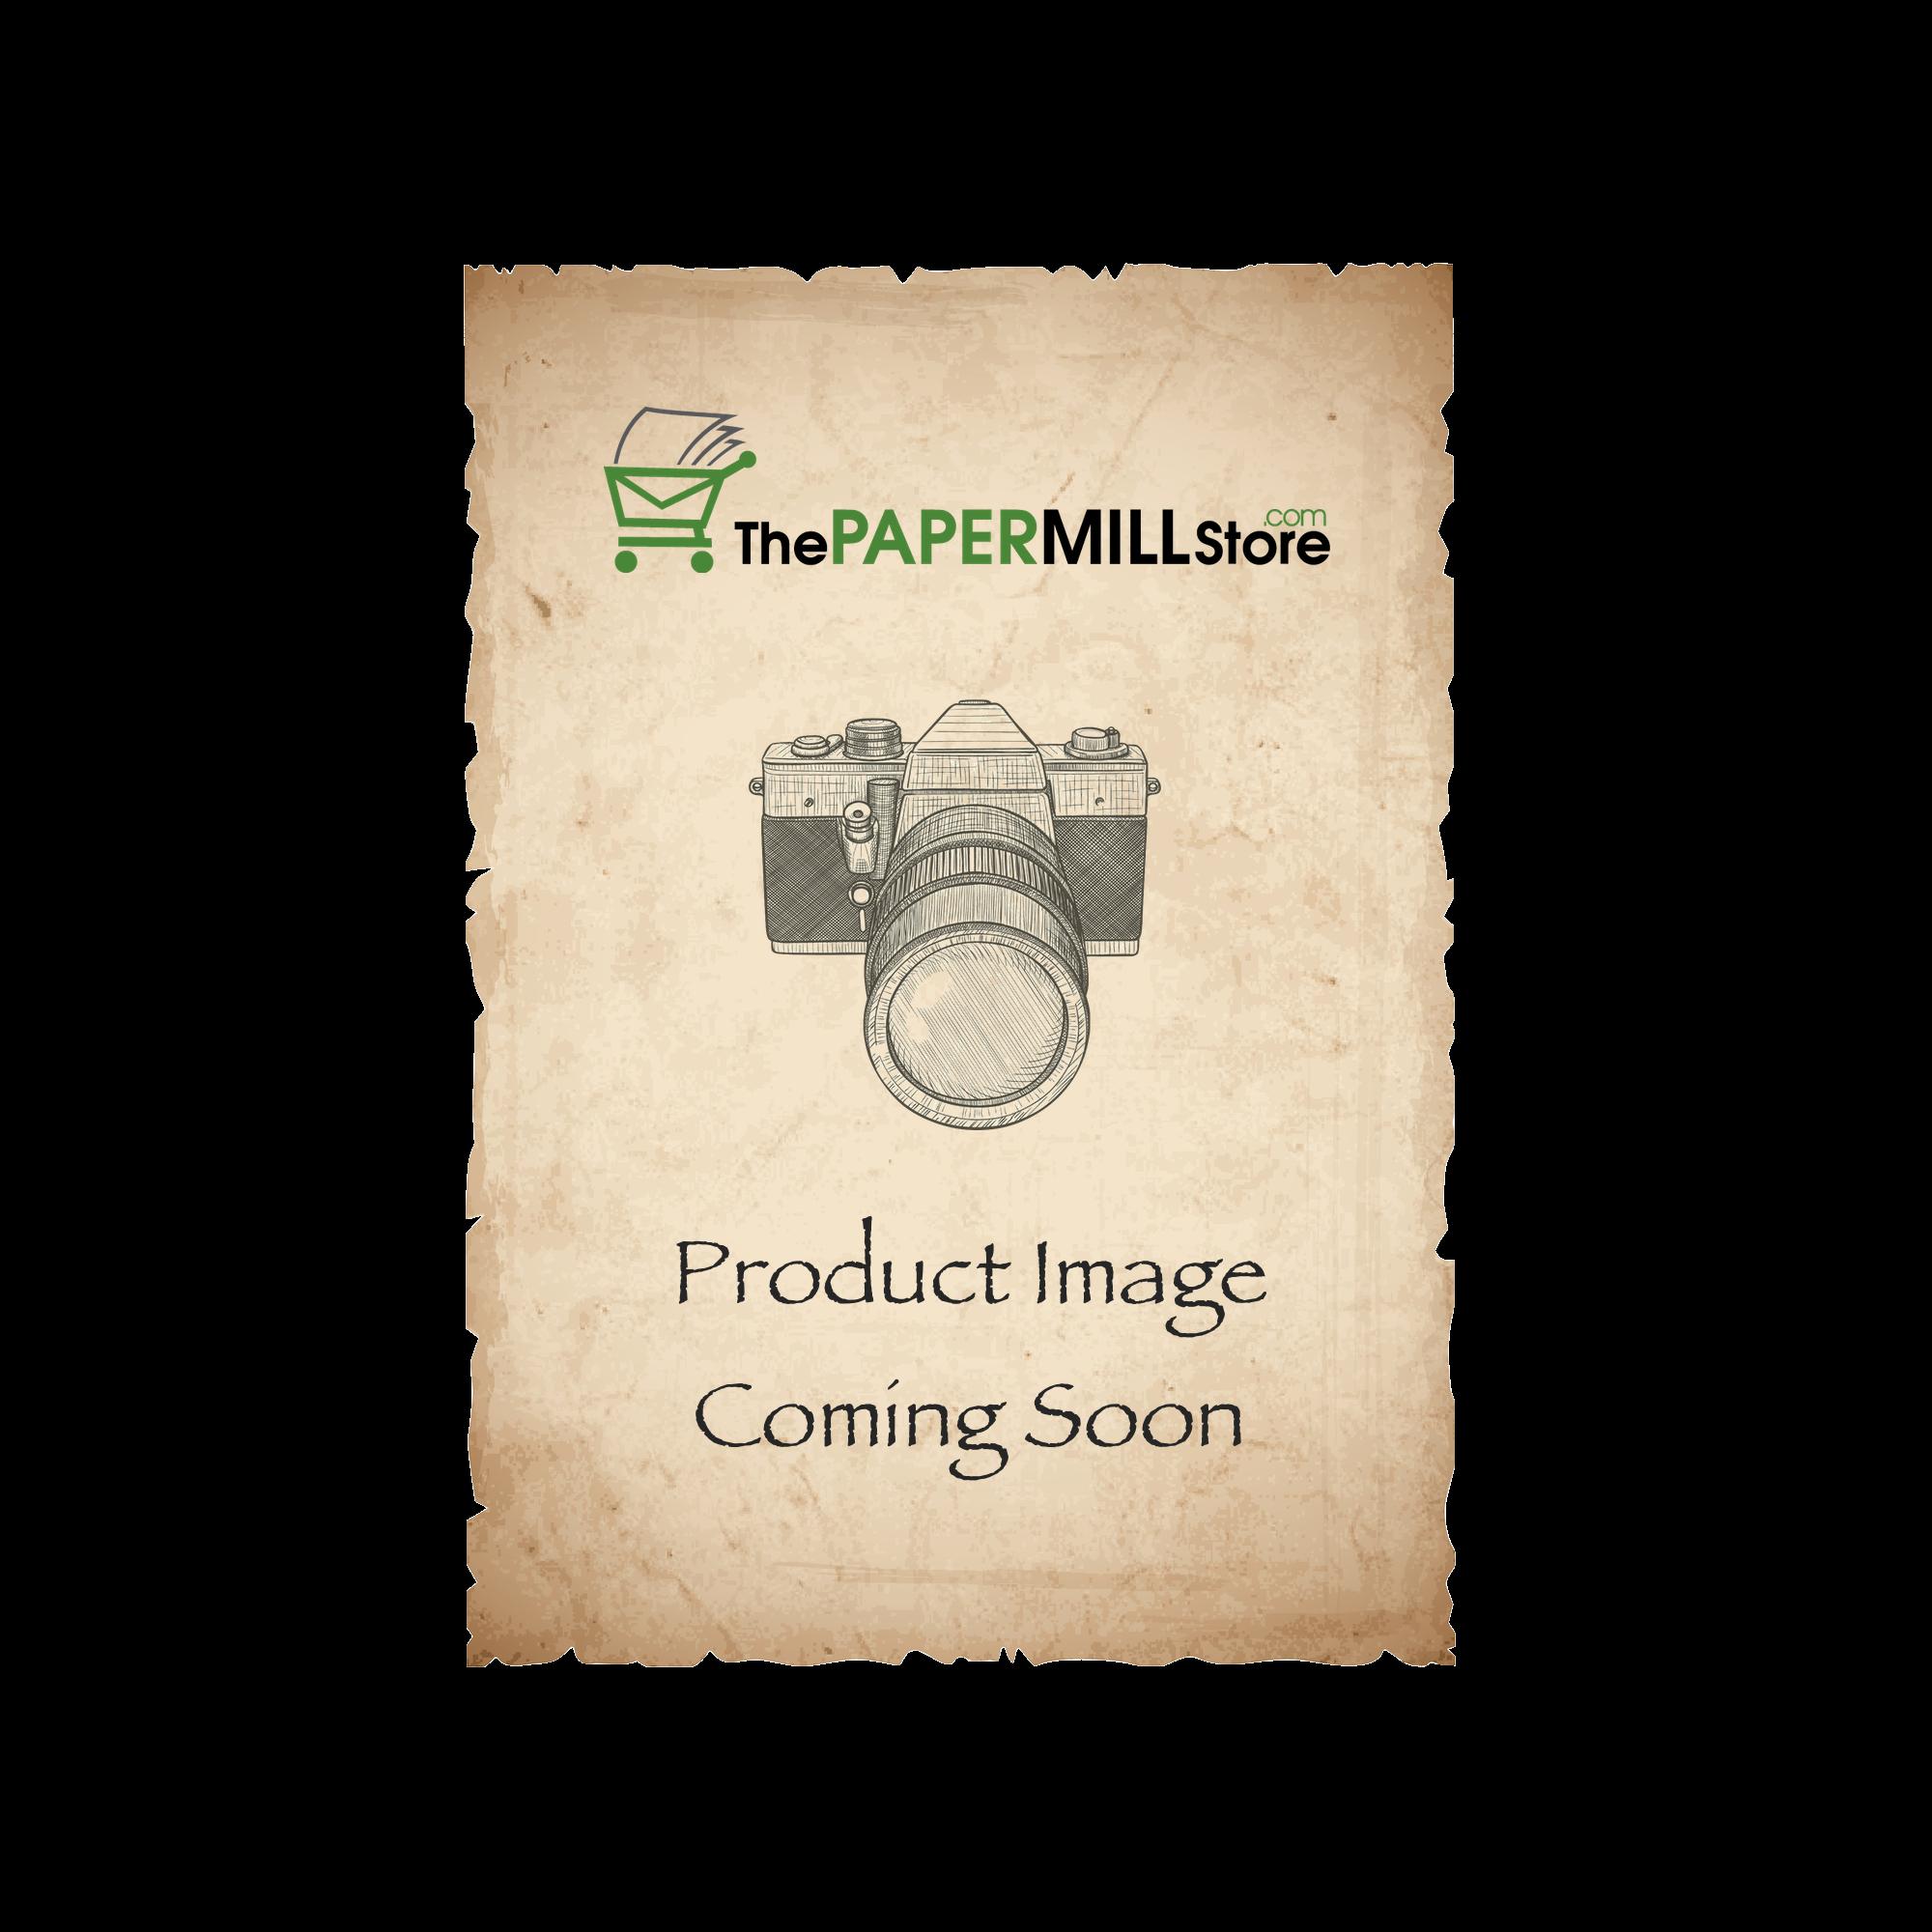 Ultrafelt Cool White Envelopes - A7 (5 1/4 x 7 1/4) 80 lb Text Premium Felt  30% Recycled 250 per Box